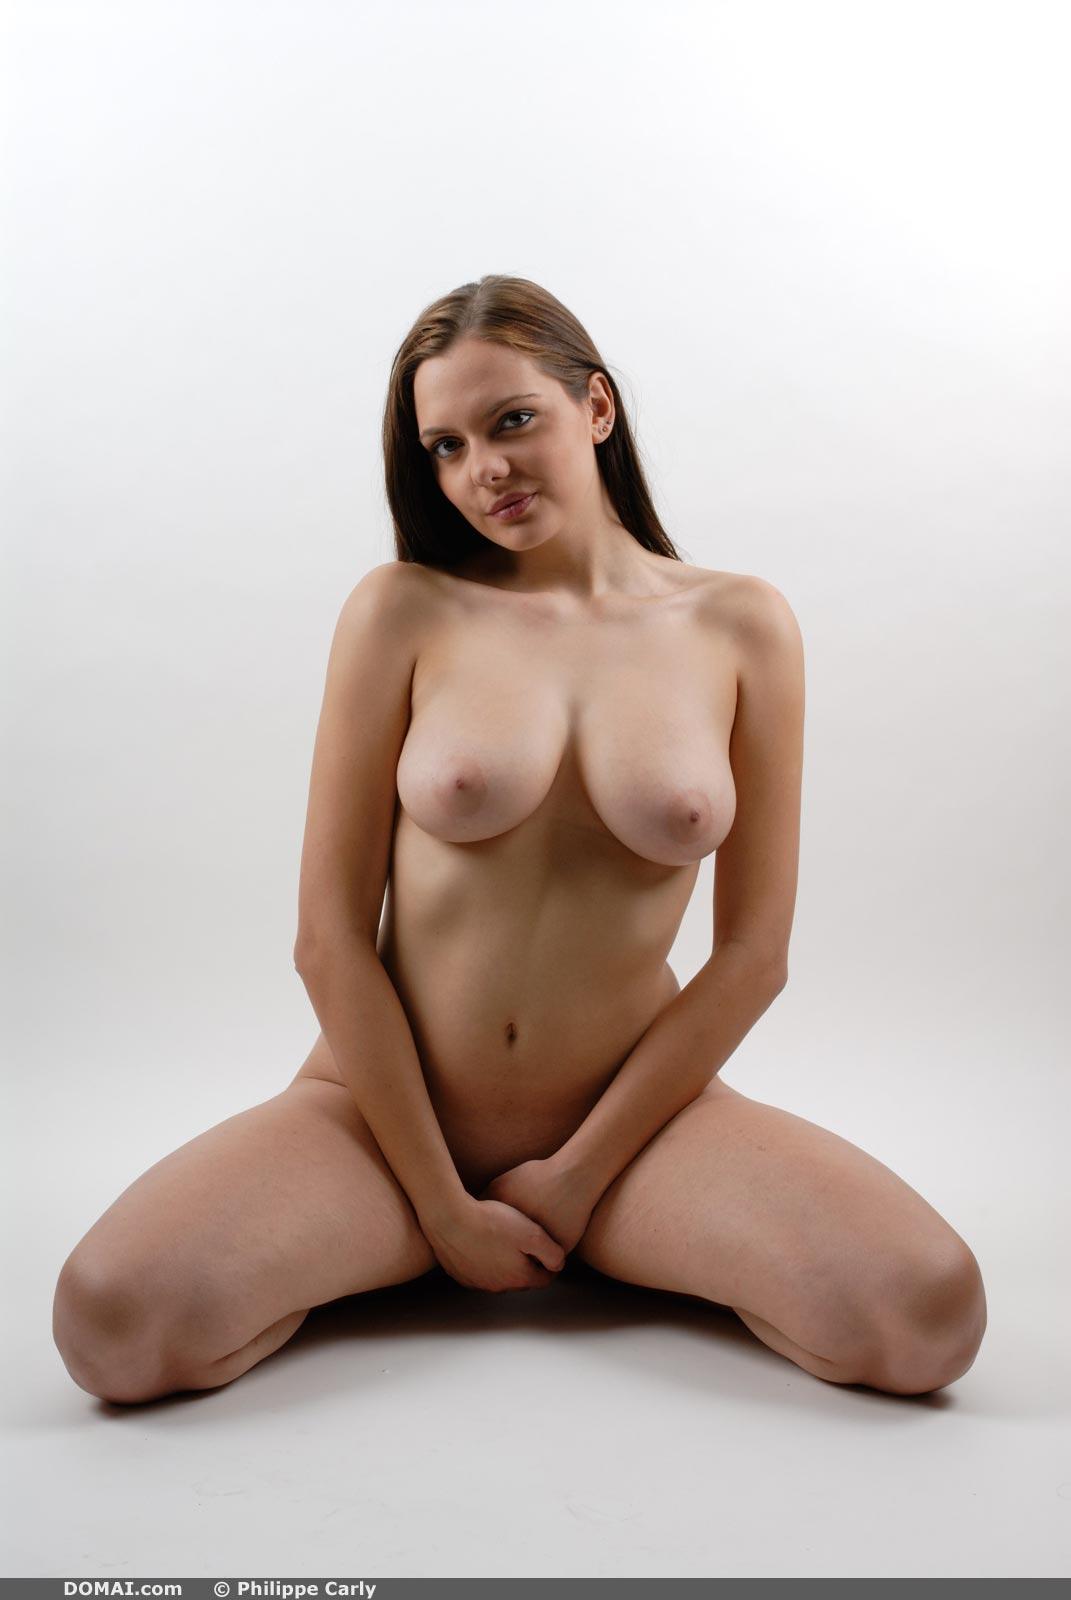 Grlfriend nude pics marlene Ex